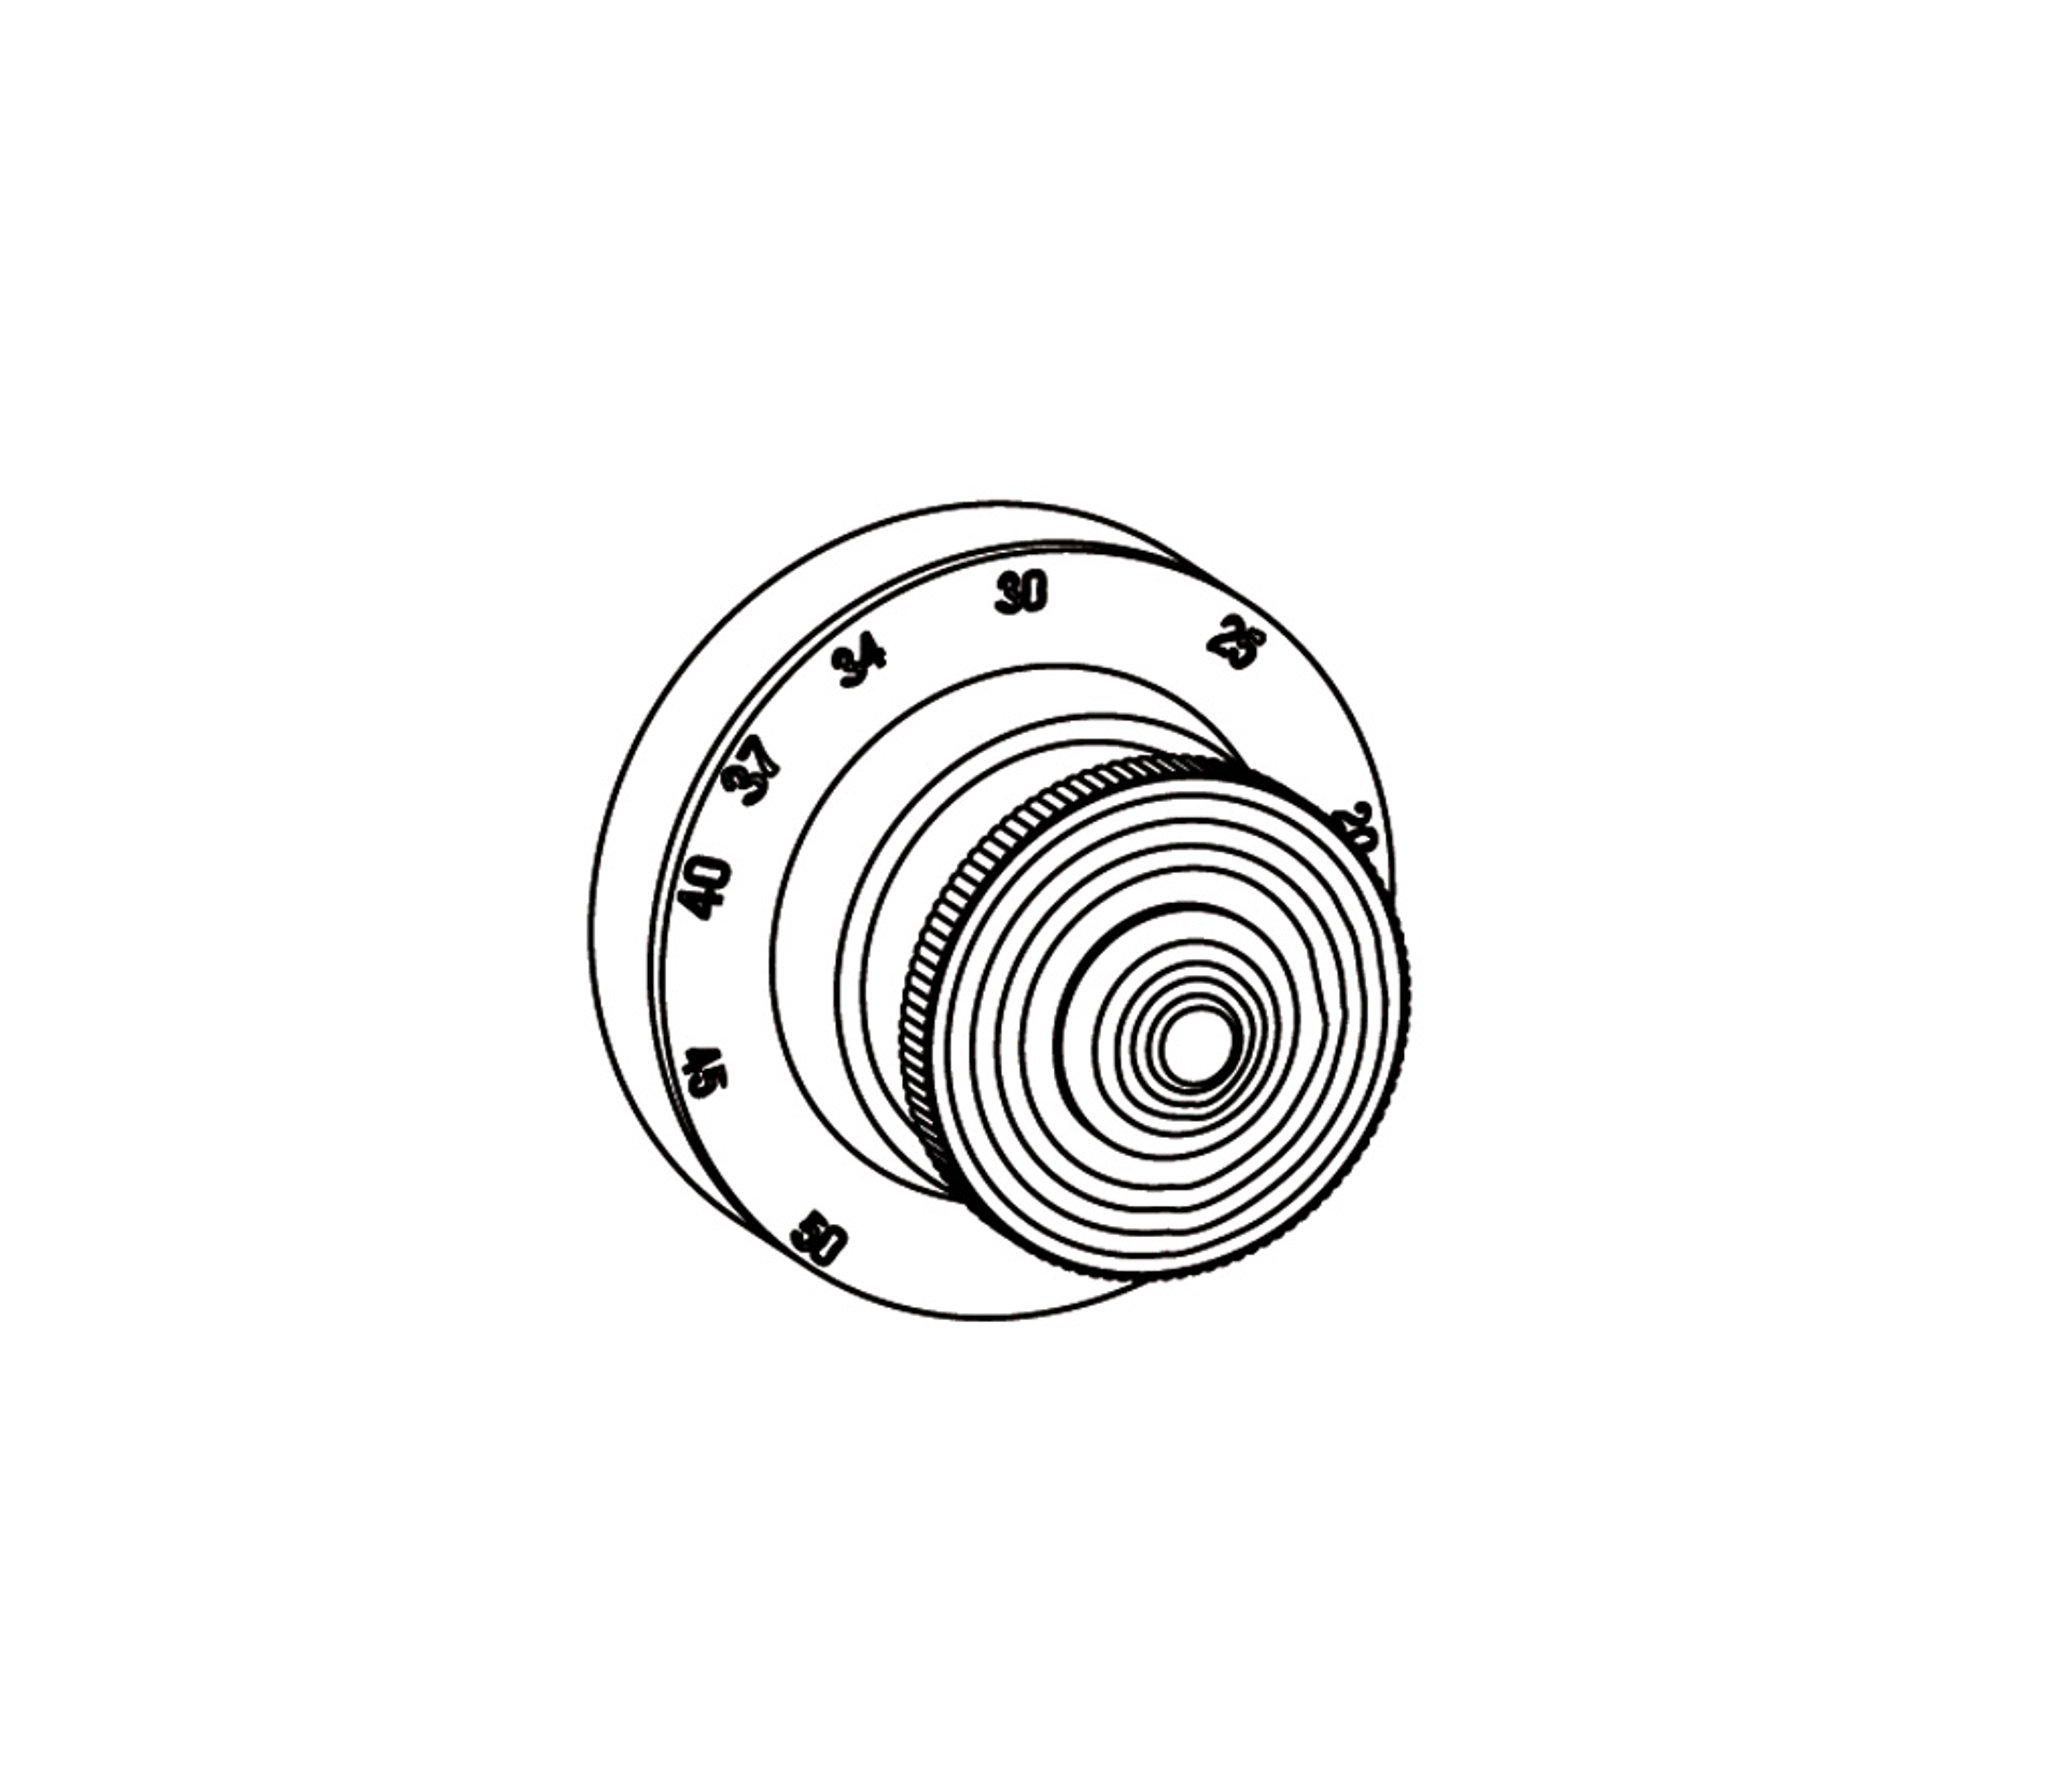 c37-4r0 plaque ronde ø80mm